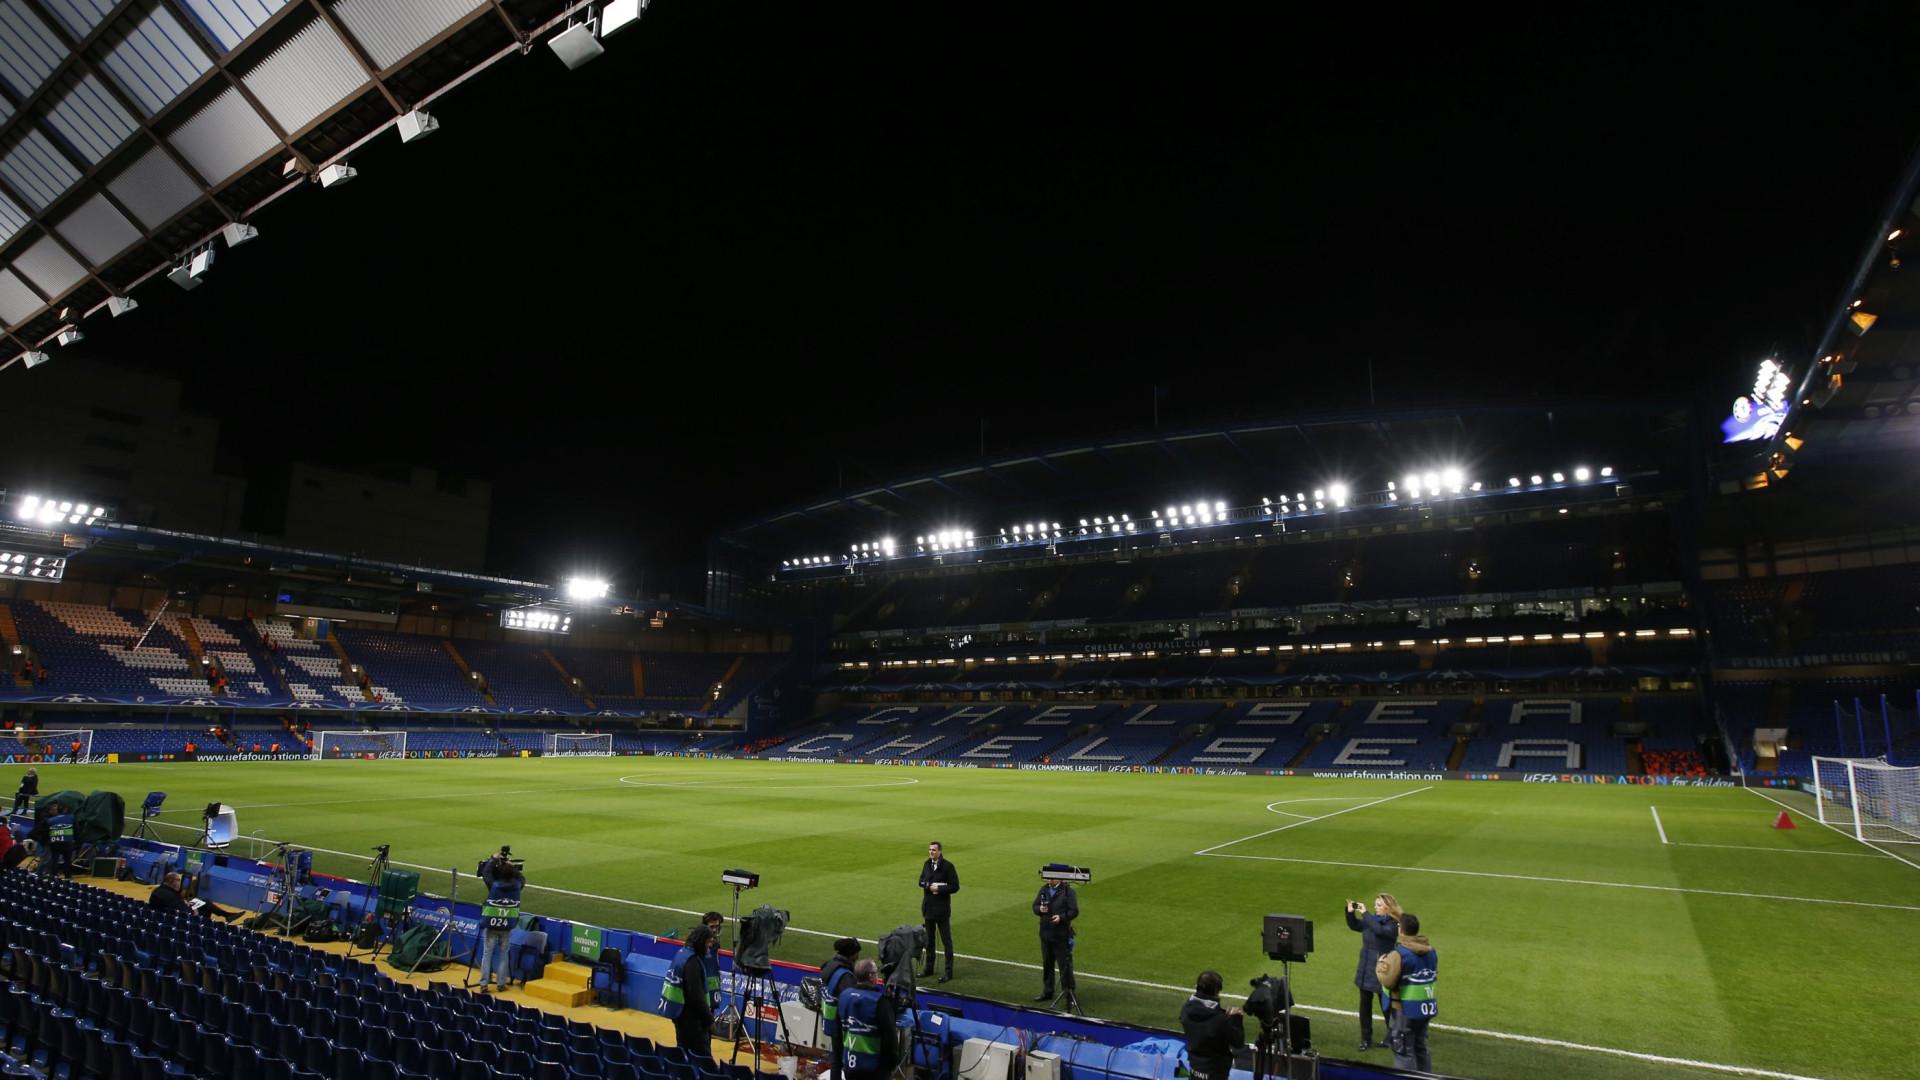 Chelsea vai investigar antigo funcionário suspeito de abusos sexuais